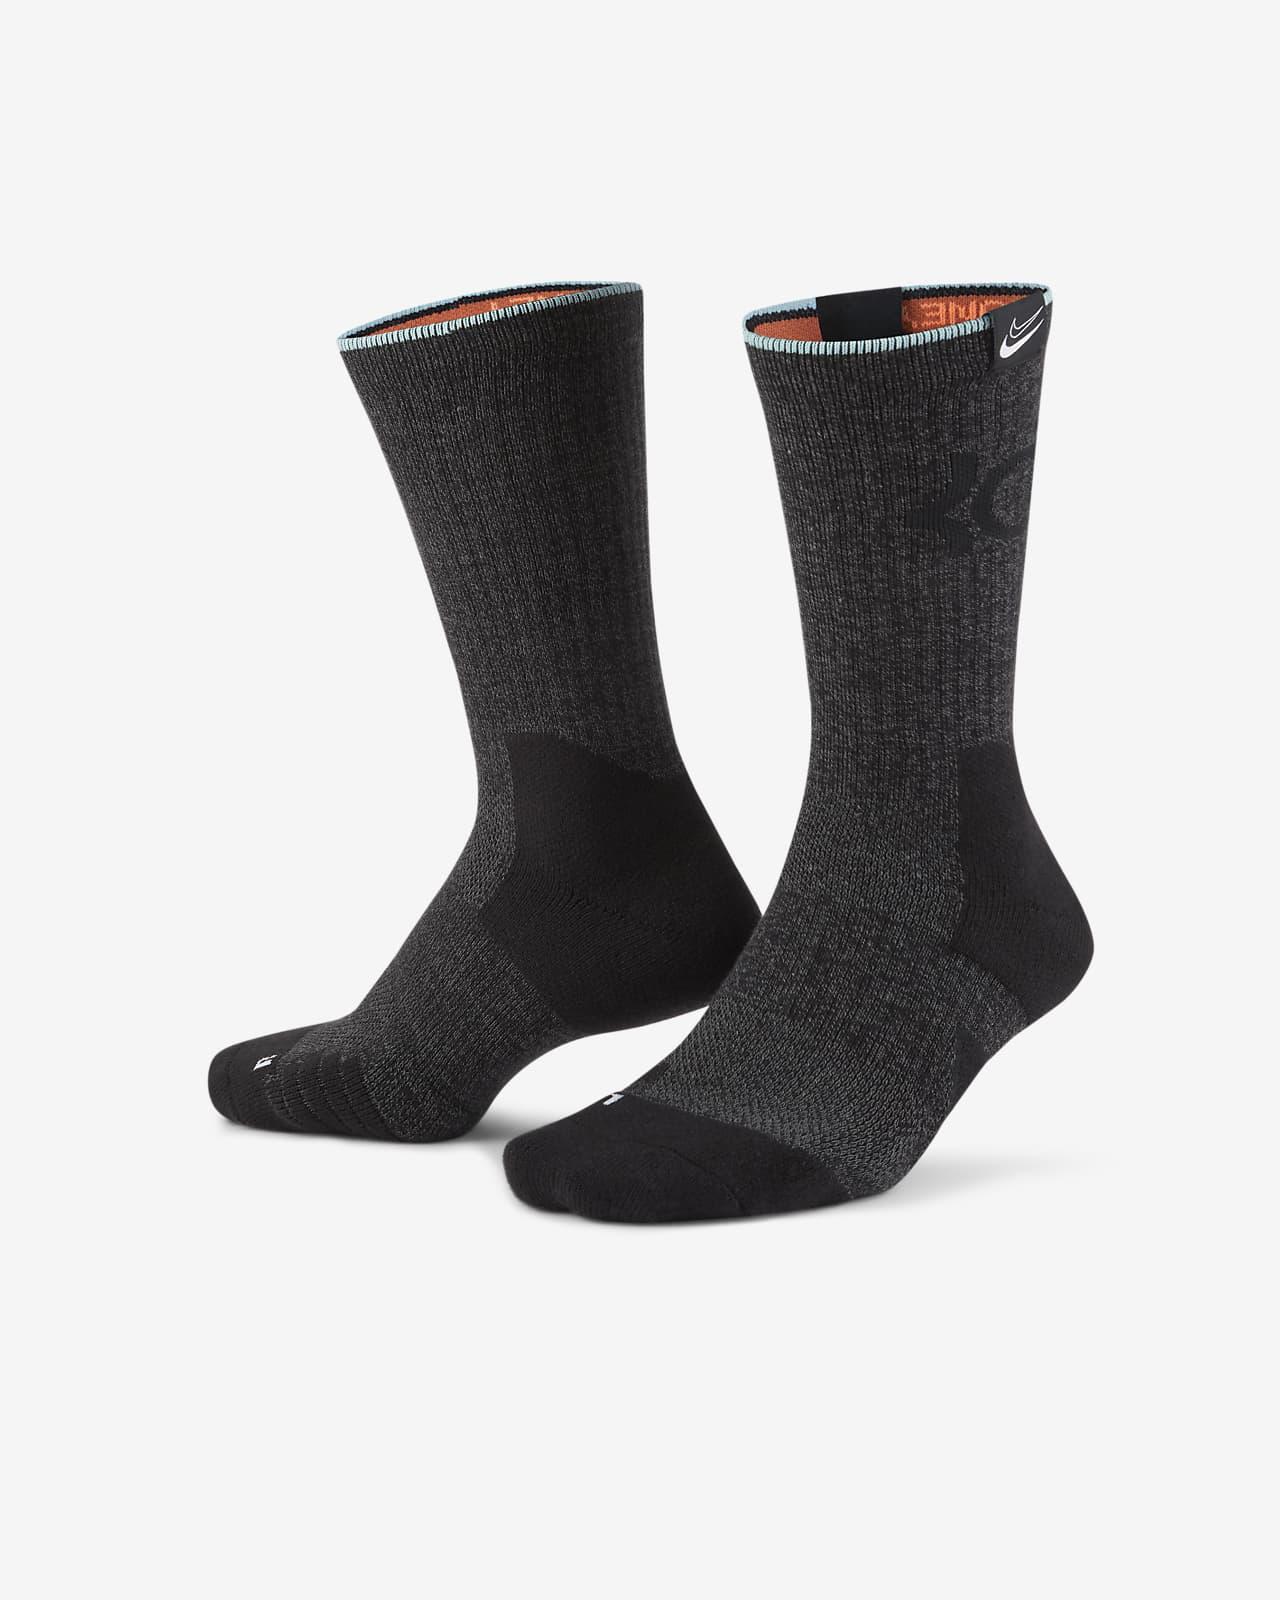 KD Elite Crew Basketball Socks